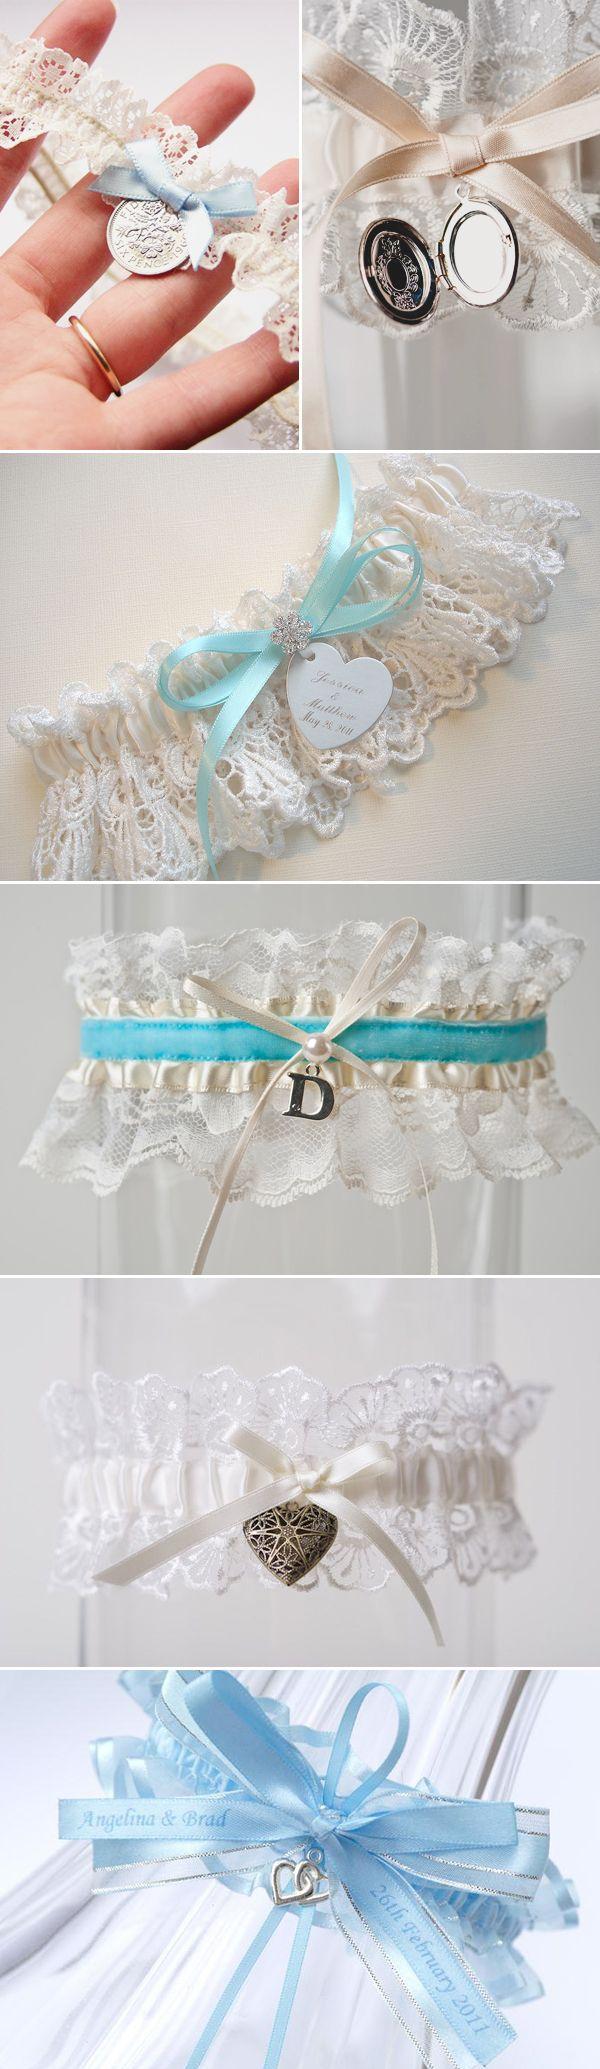 best 25+ bridal garters ideas on pinterest | wedding garter lace